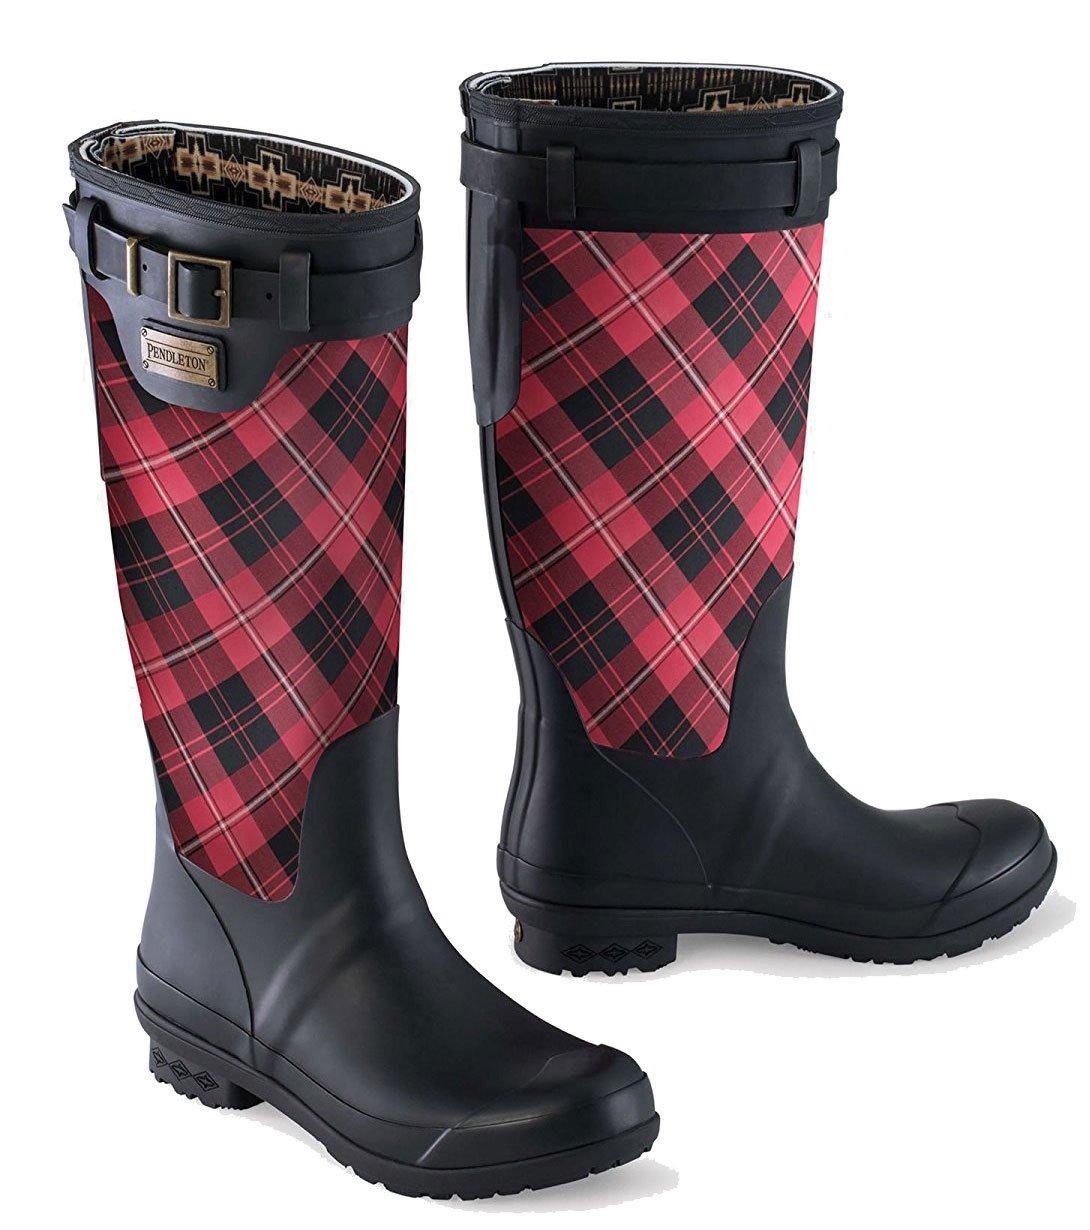 Pendleton NATIONAL PARK 8 TALL RAIN BOOTS B077YN8XSS 8 PARK B(M) US|Scarlet Cunningham a3344d